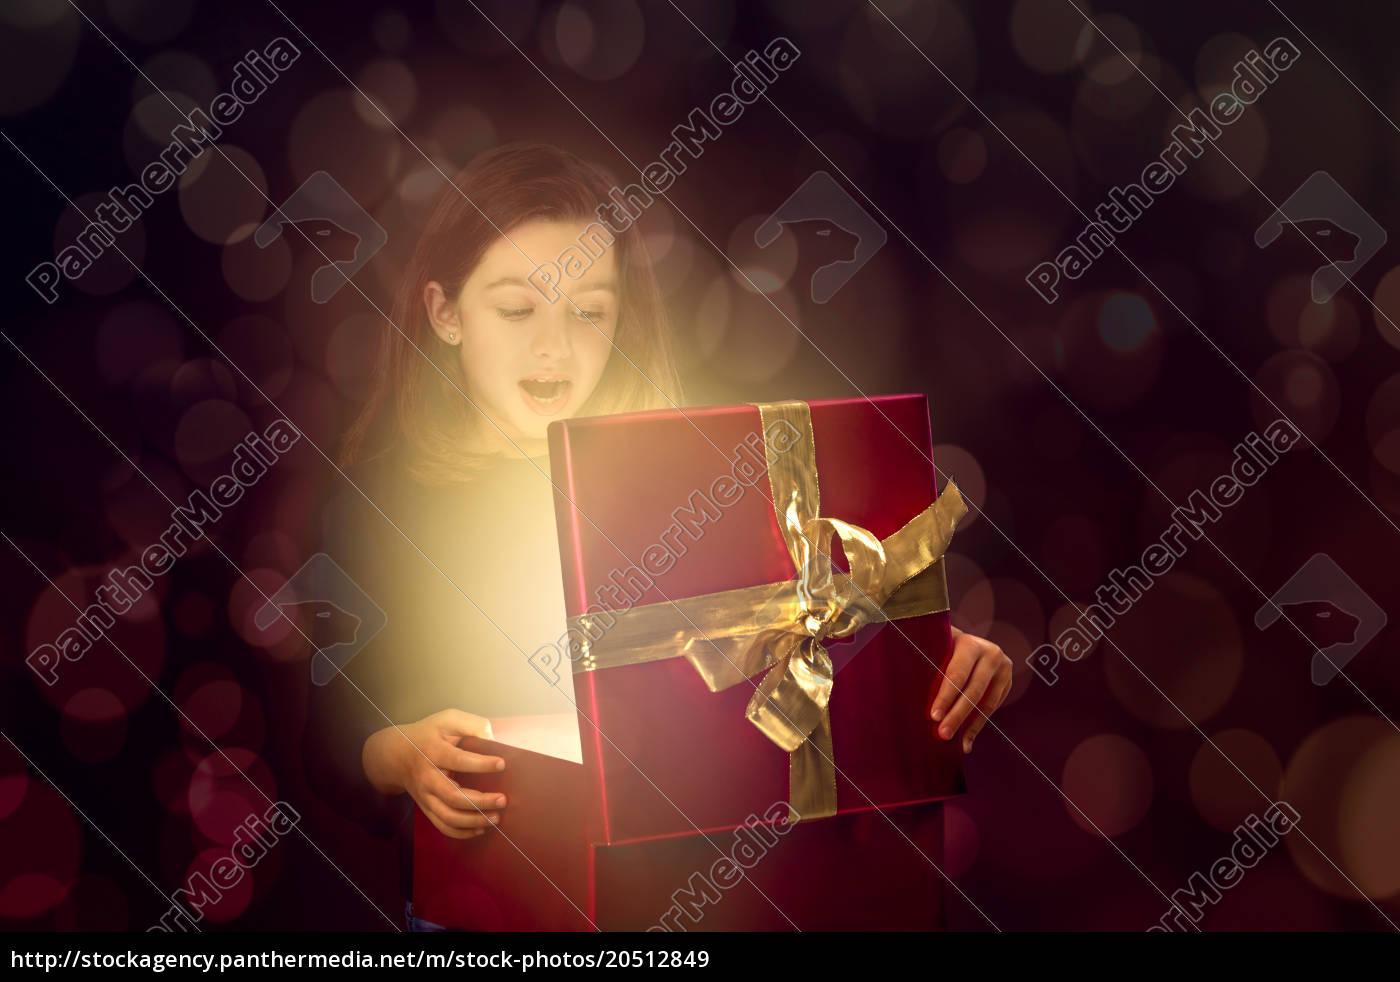 little, girl, opening, a, magic, box - 20512849